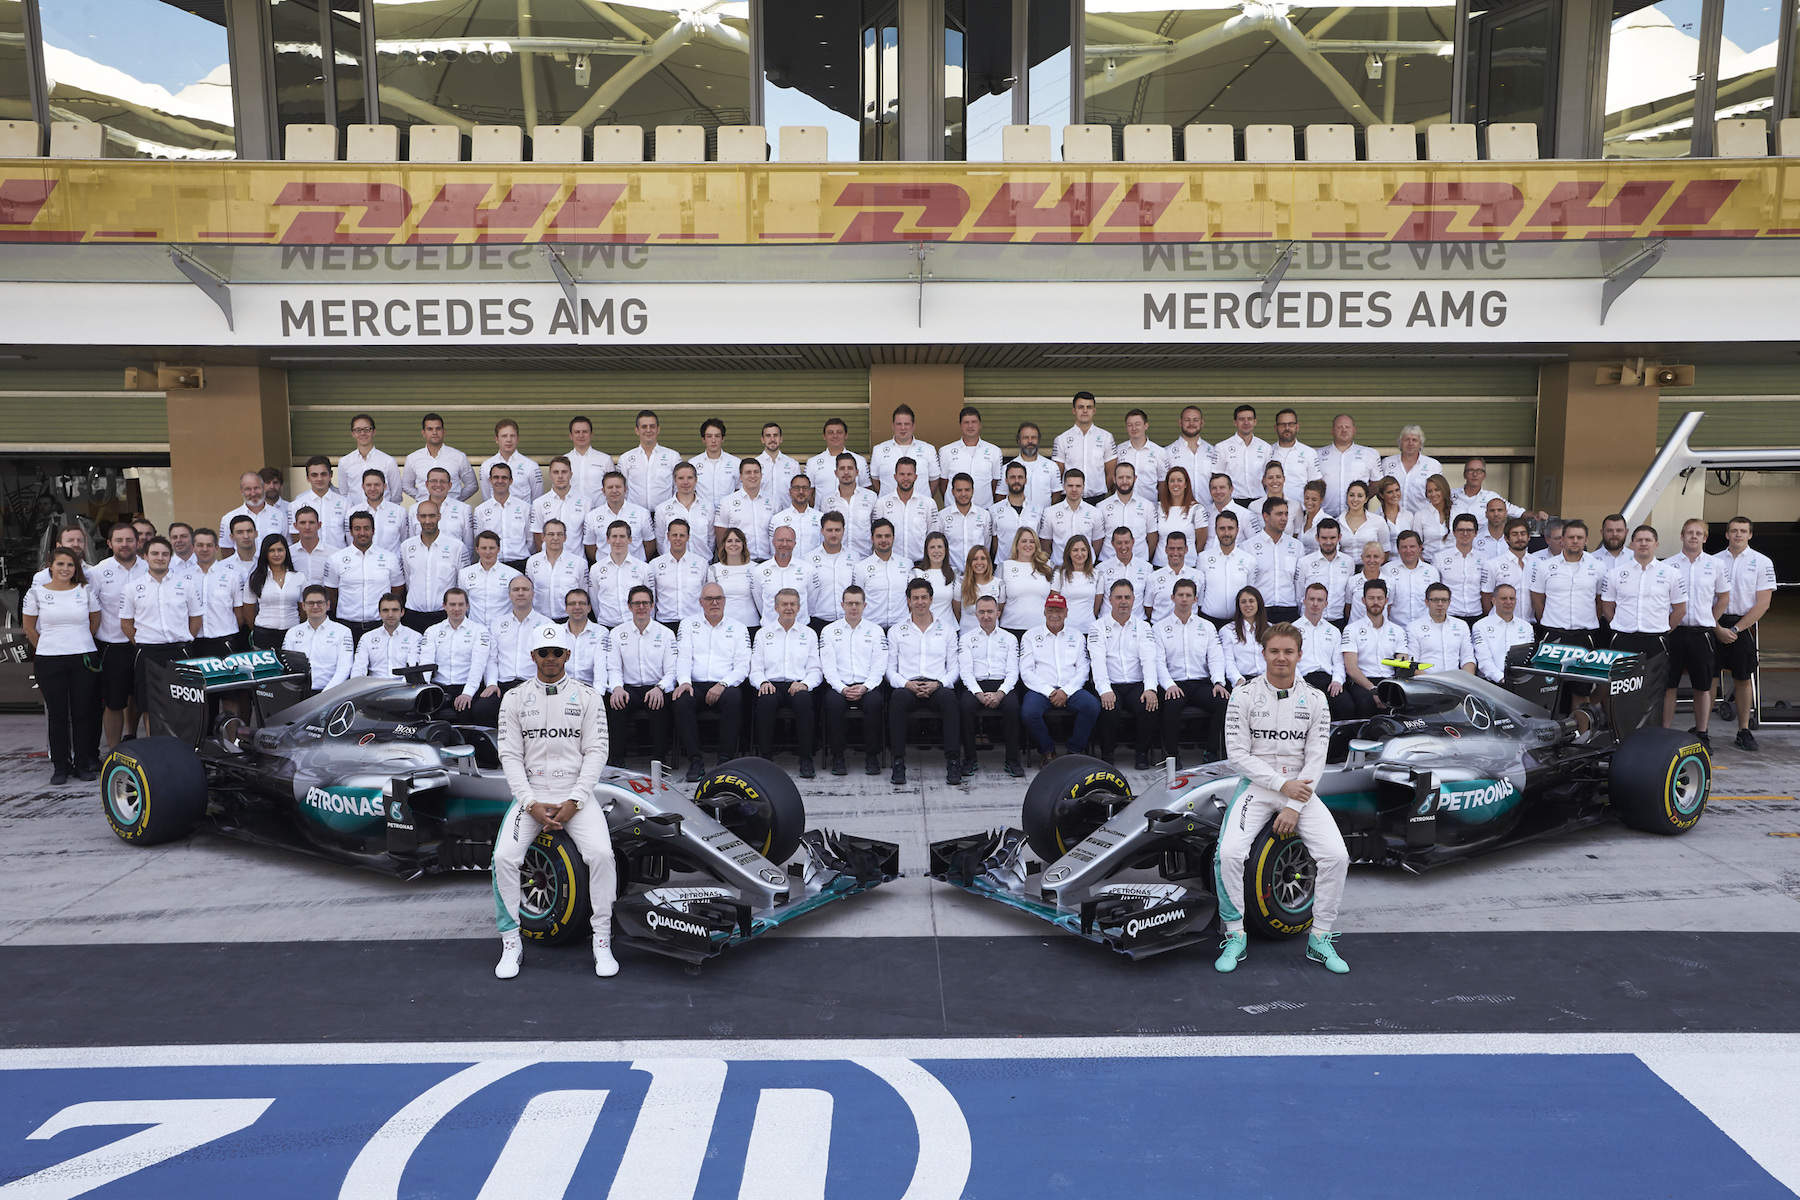 Salracing - Mercedes AMG Petronas family photo